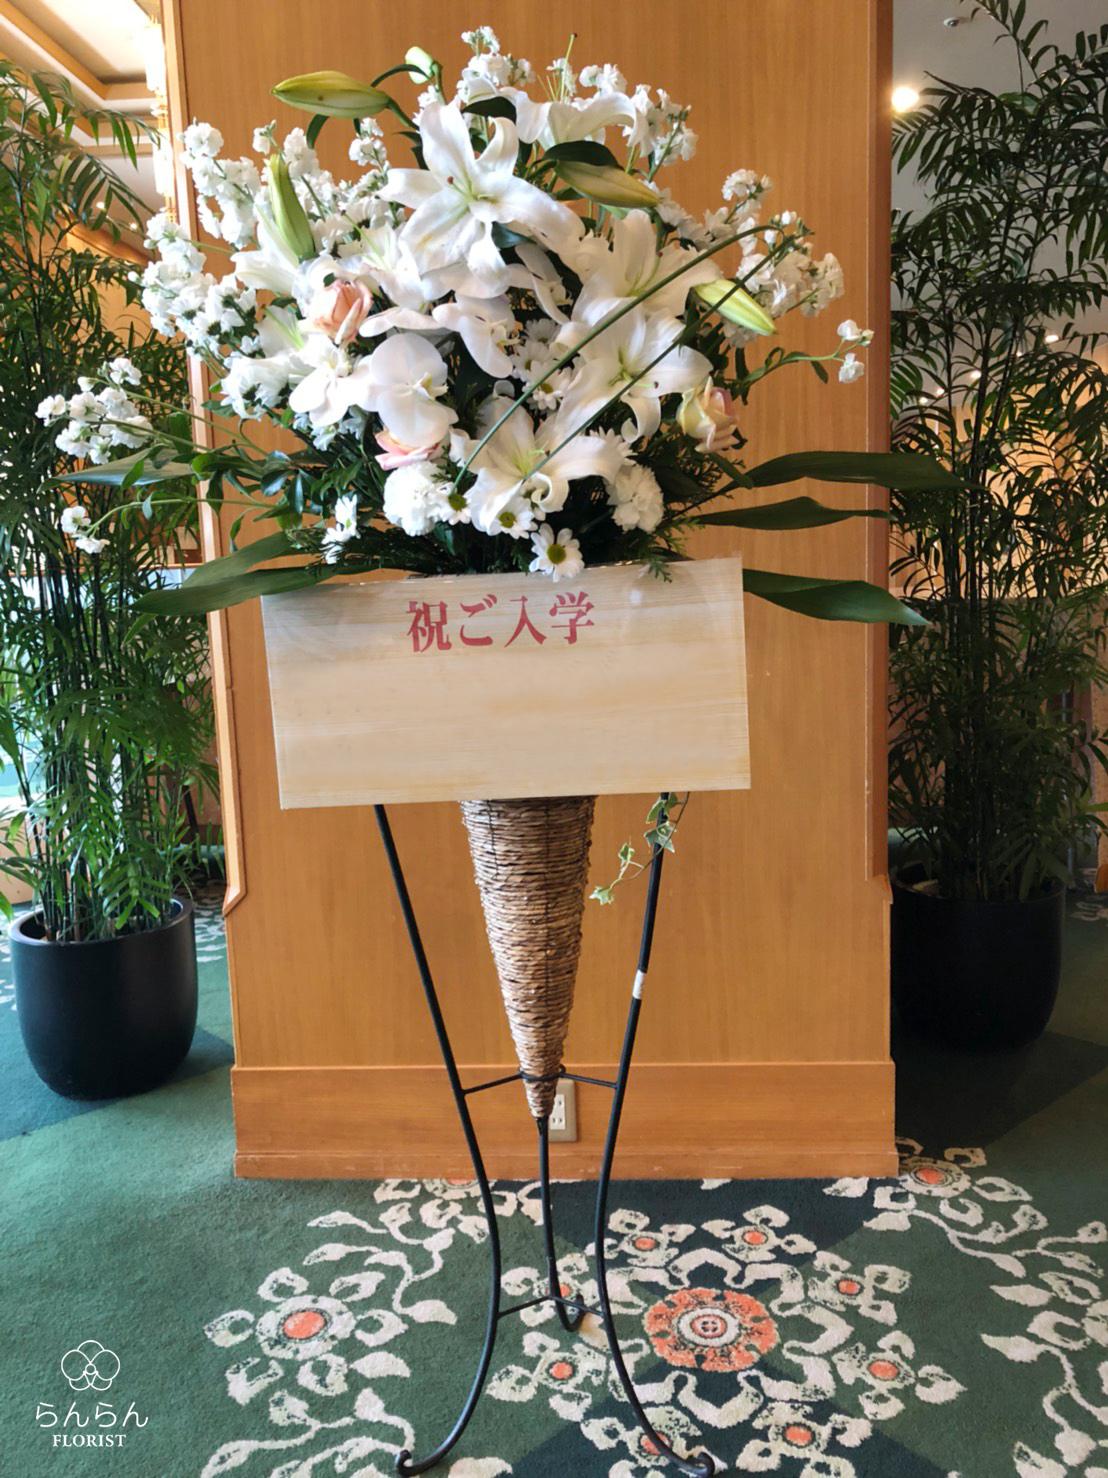 福岡美容専門学校 スタンド花